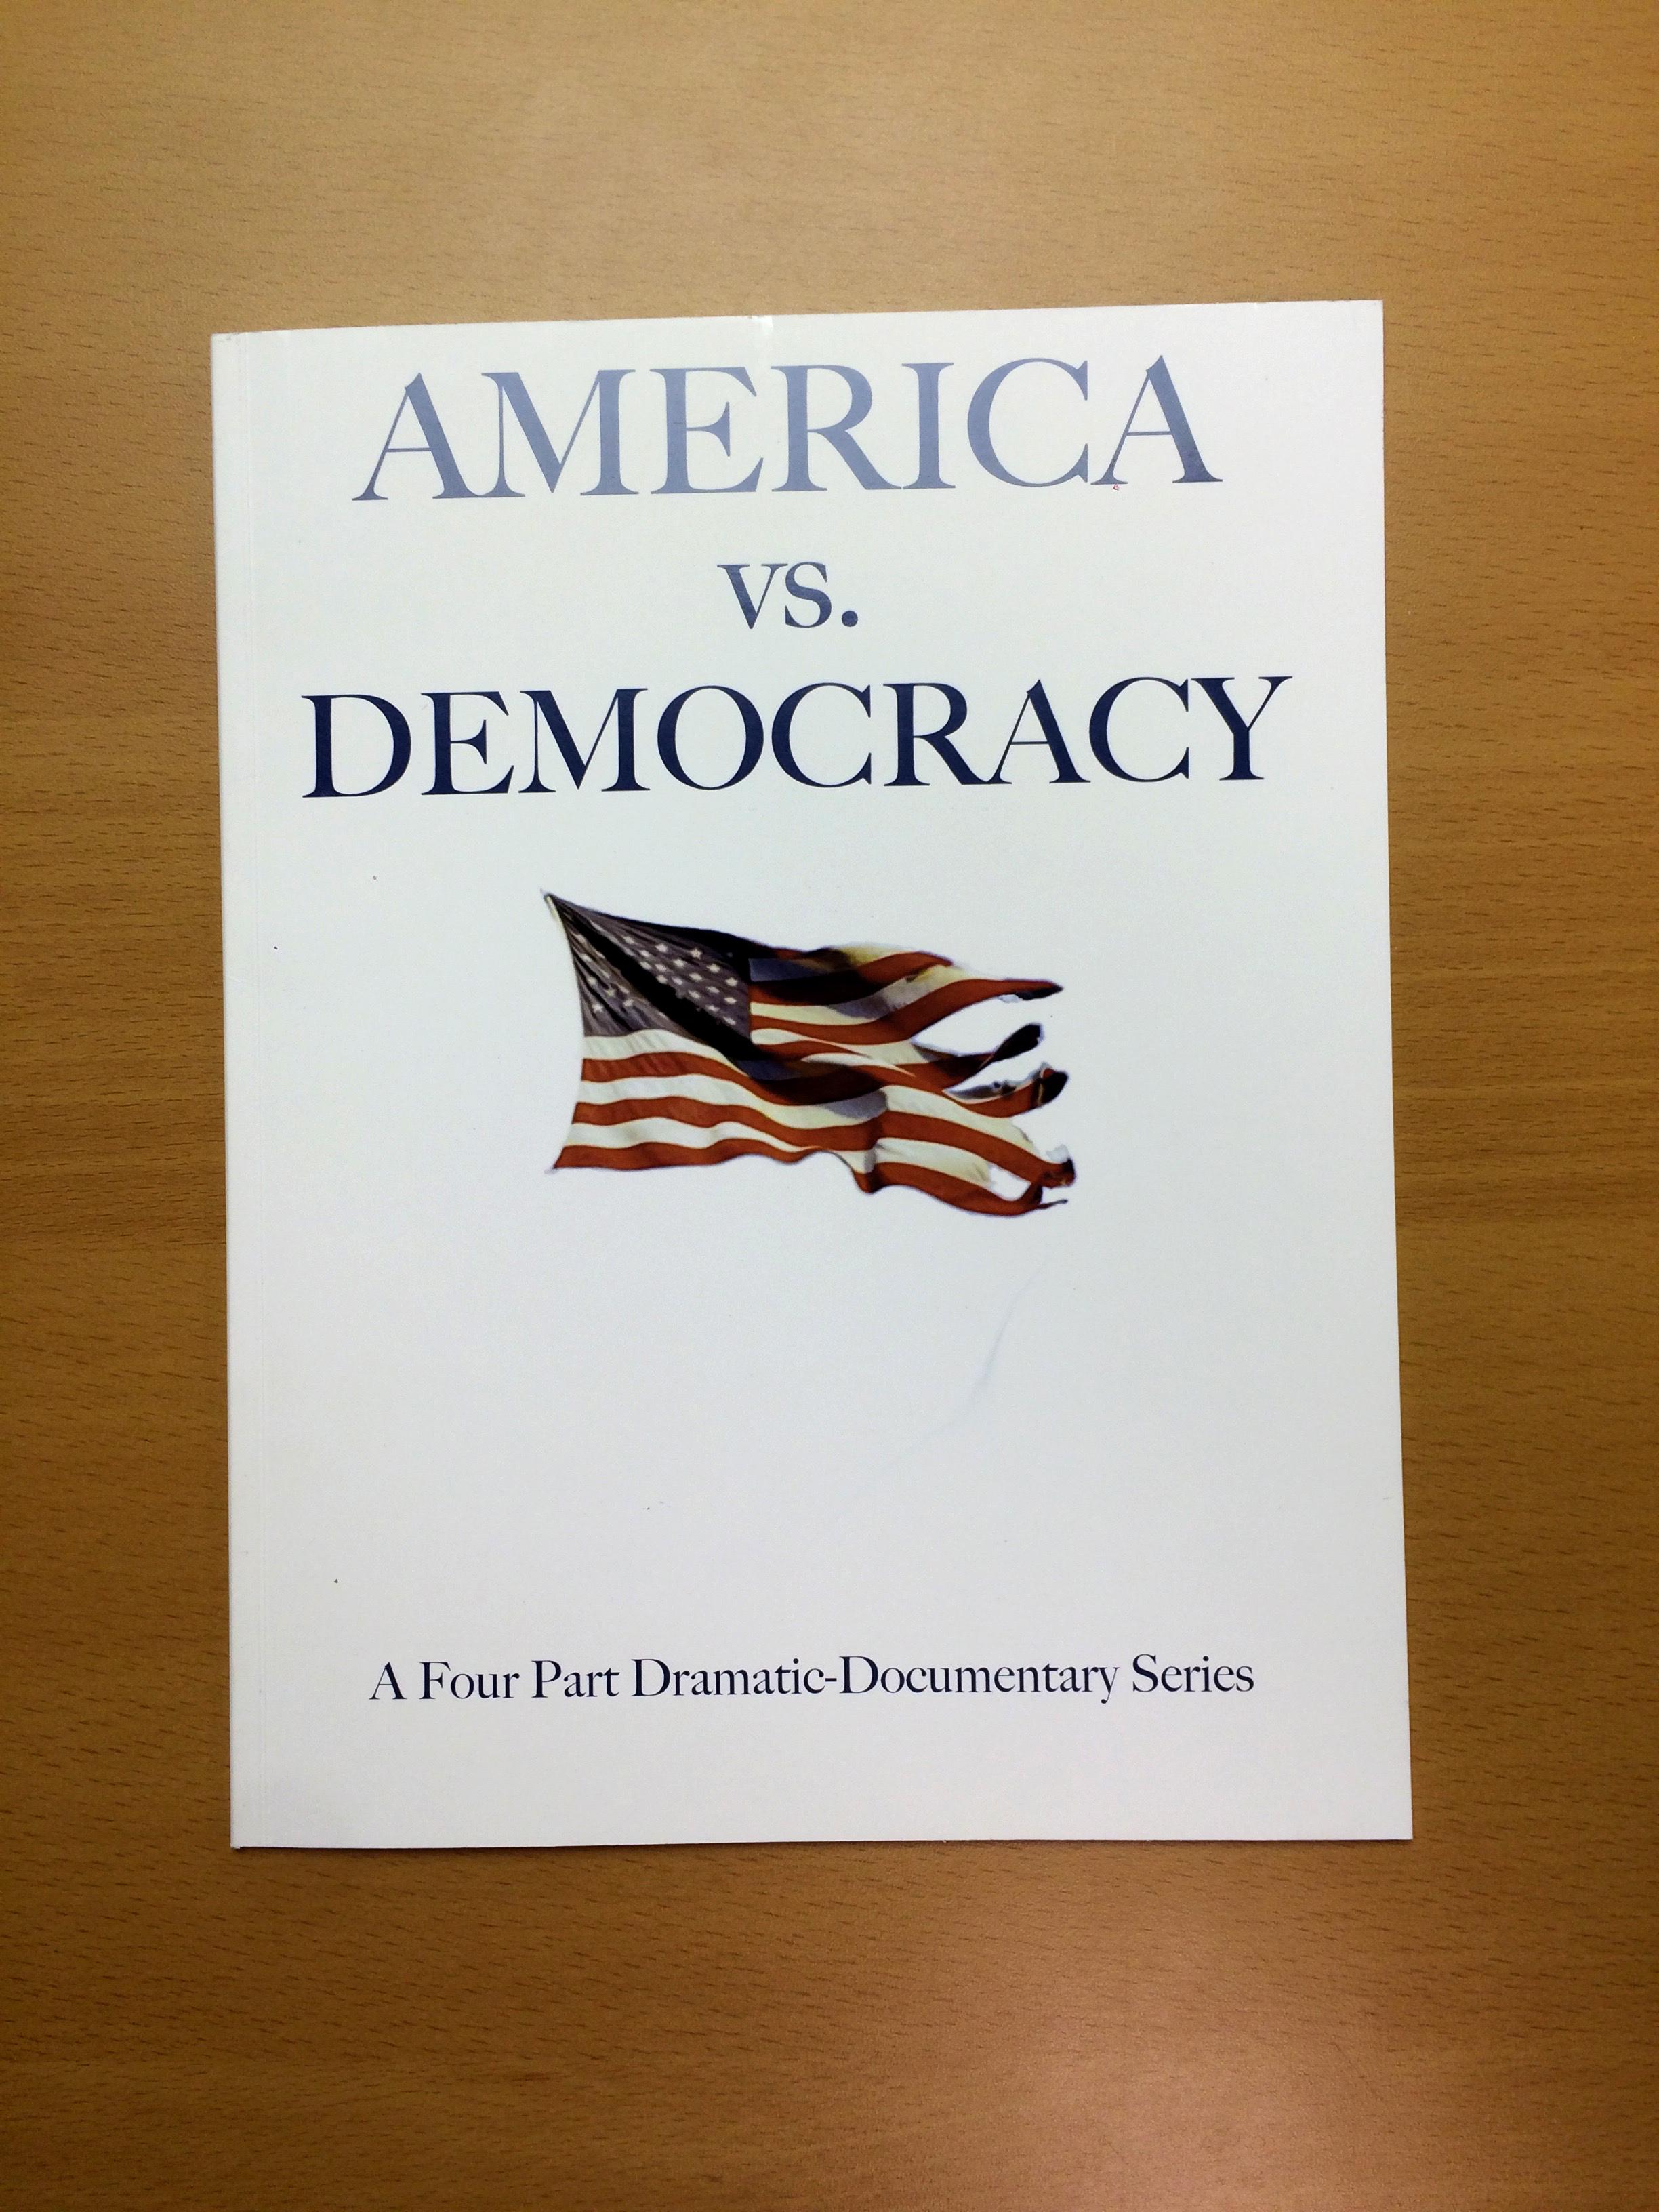 Perfect bound political book